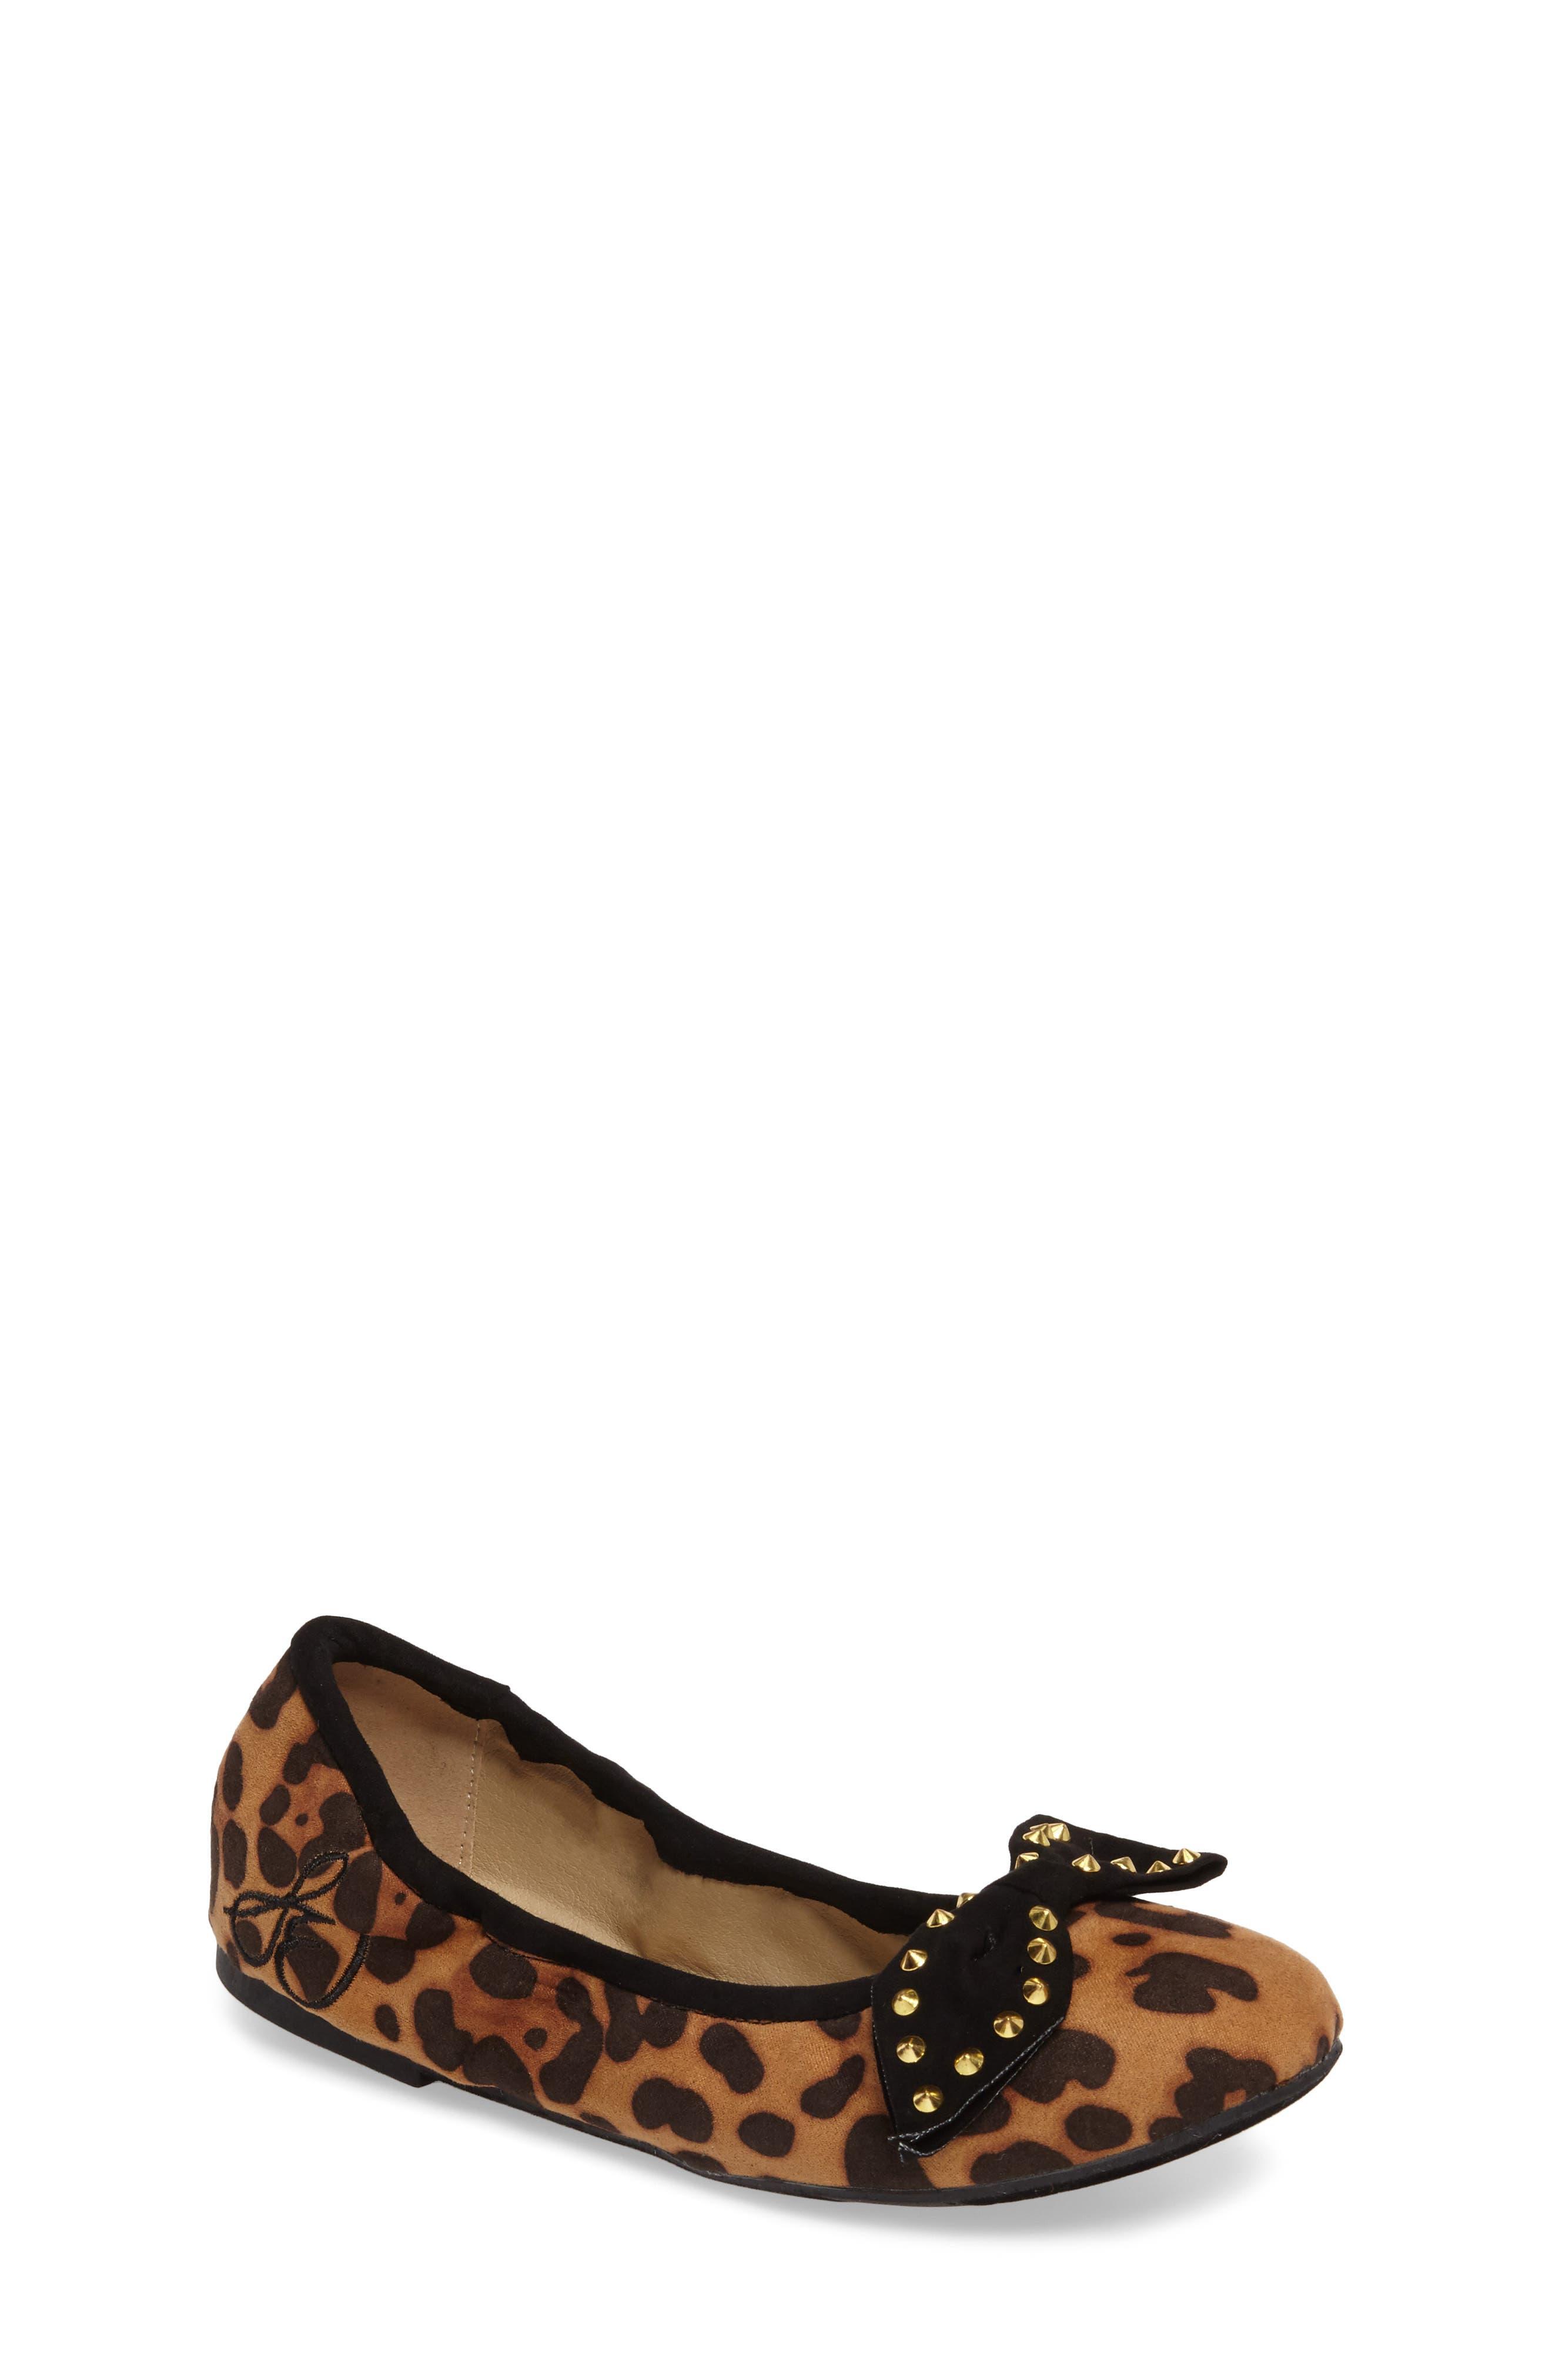 'Felicia' Ballet Flat,                         Main,                         color, Black Cheetah